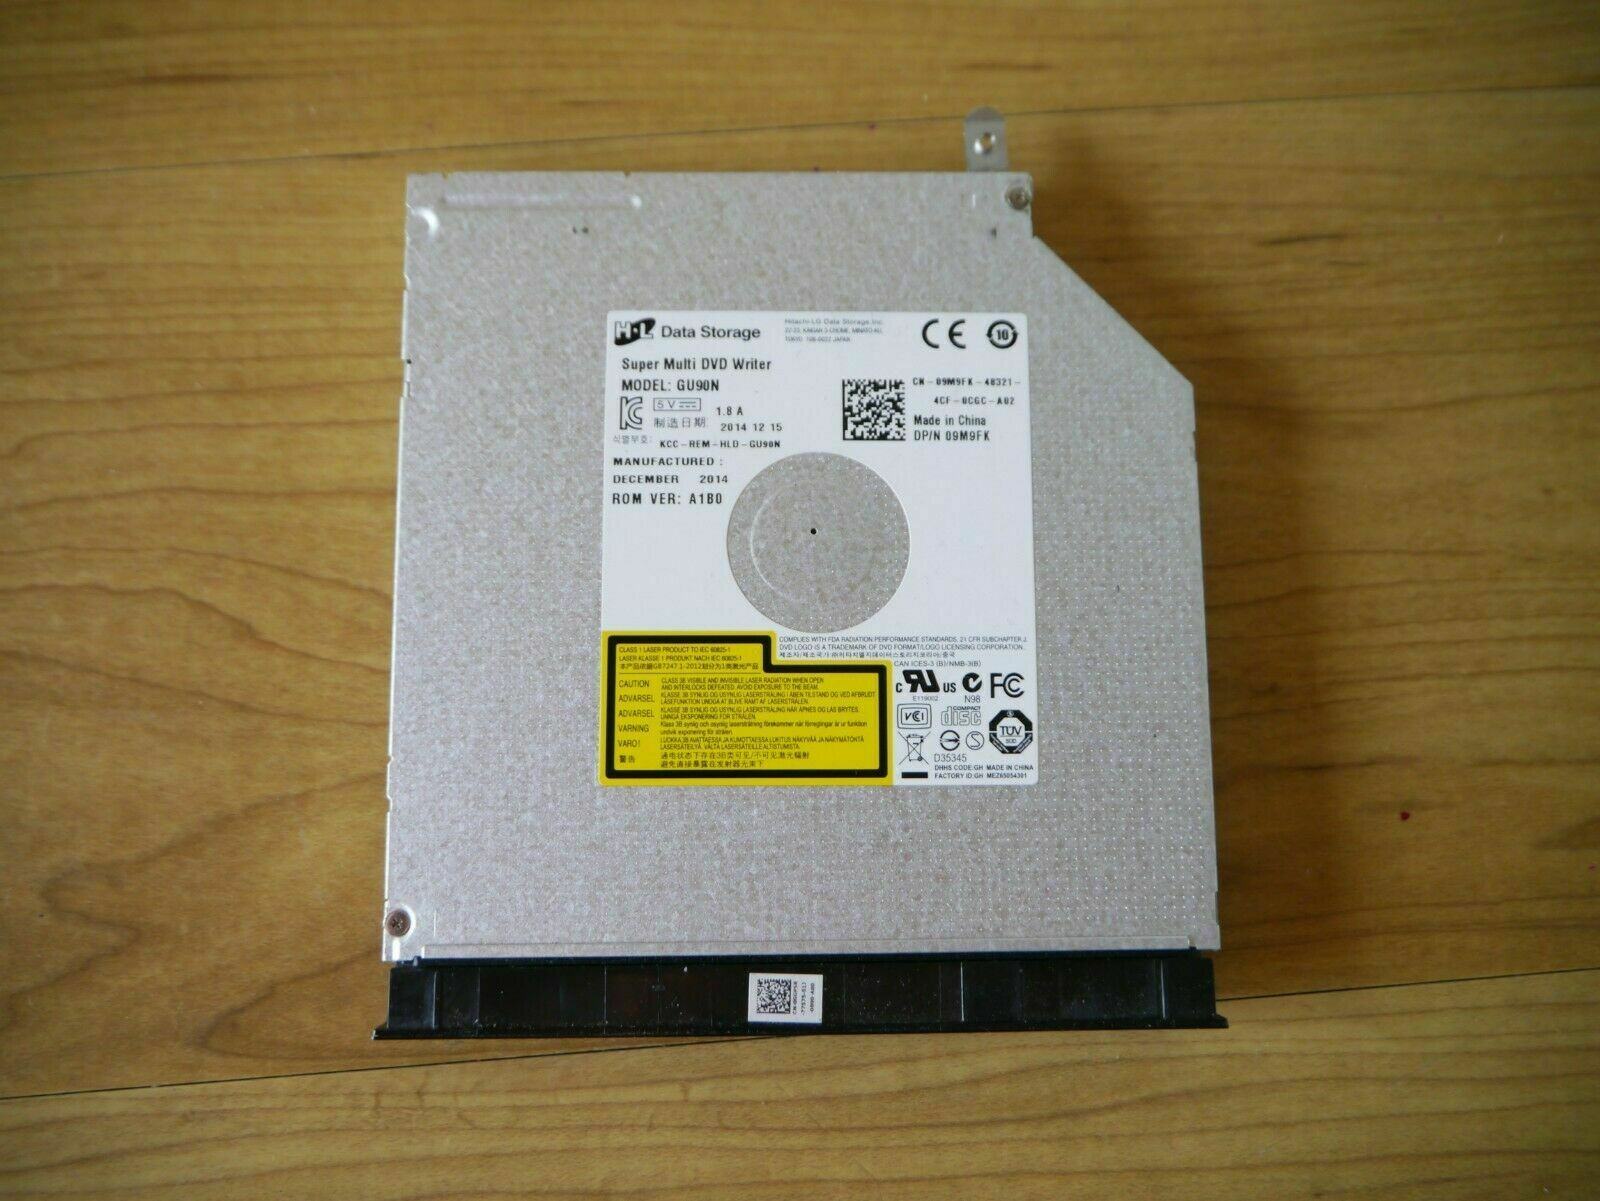 Dell Inspiron 3668 Desktop Genuine Super Multi DVD Burner Drive Gu90n 9m9fk